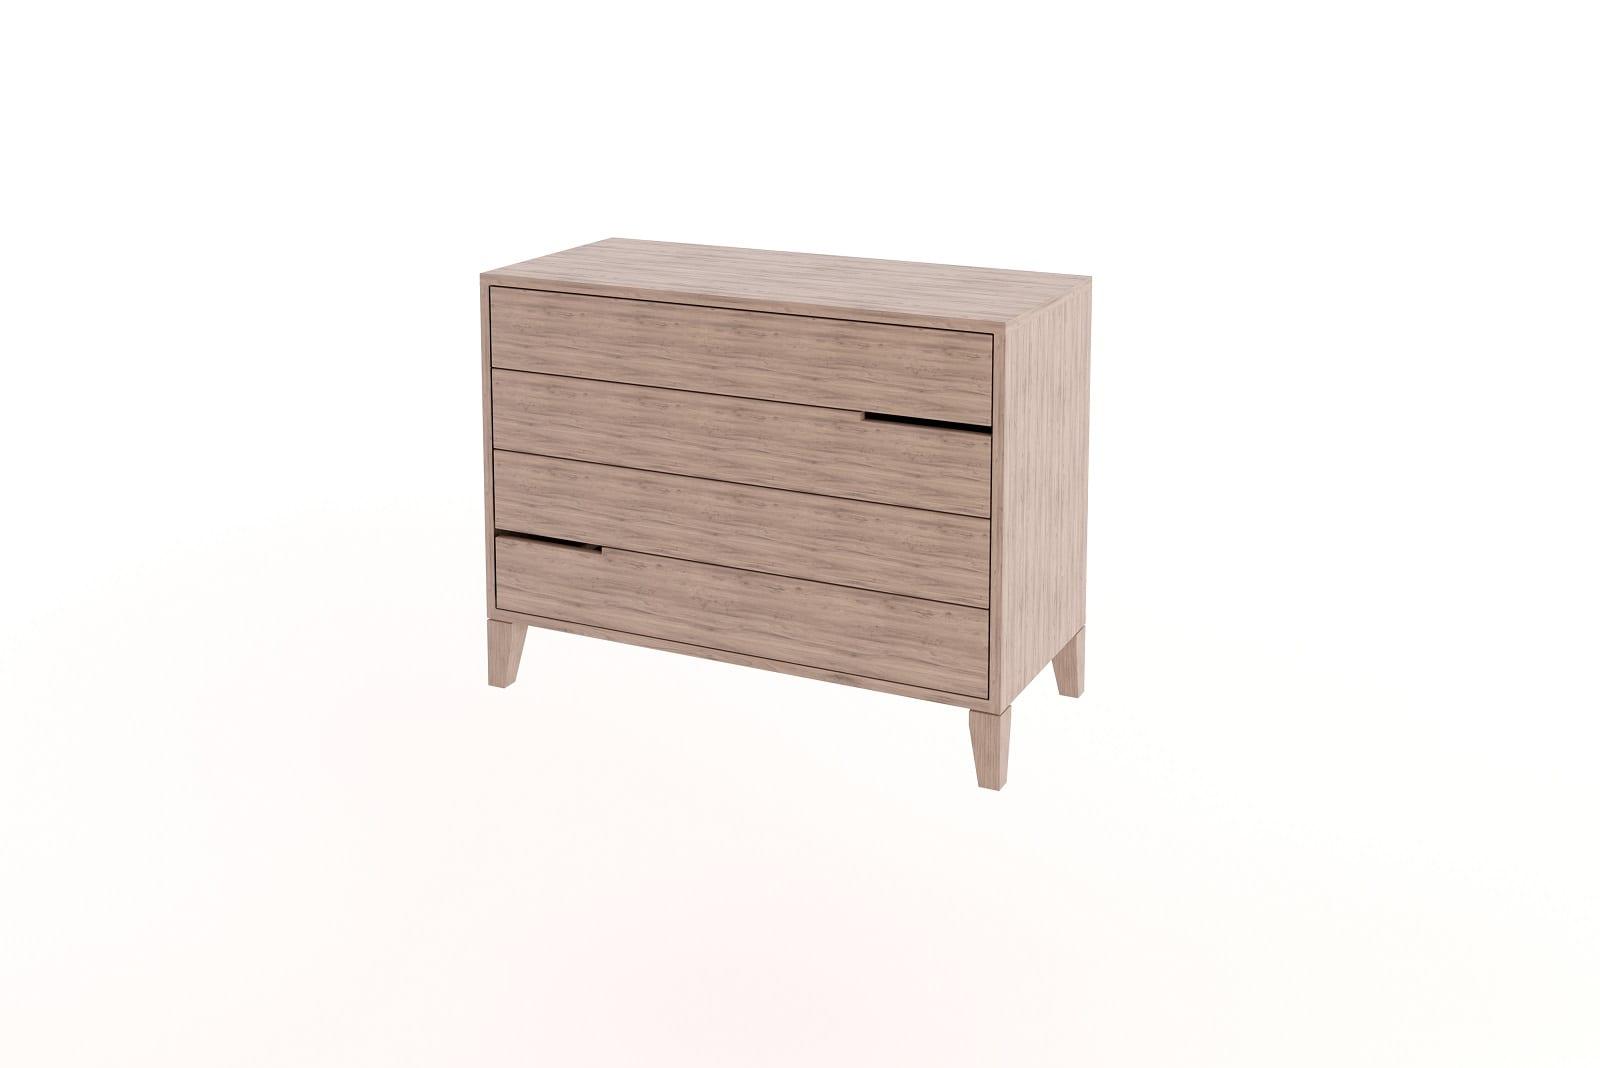 4 Drawer Cabinet